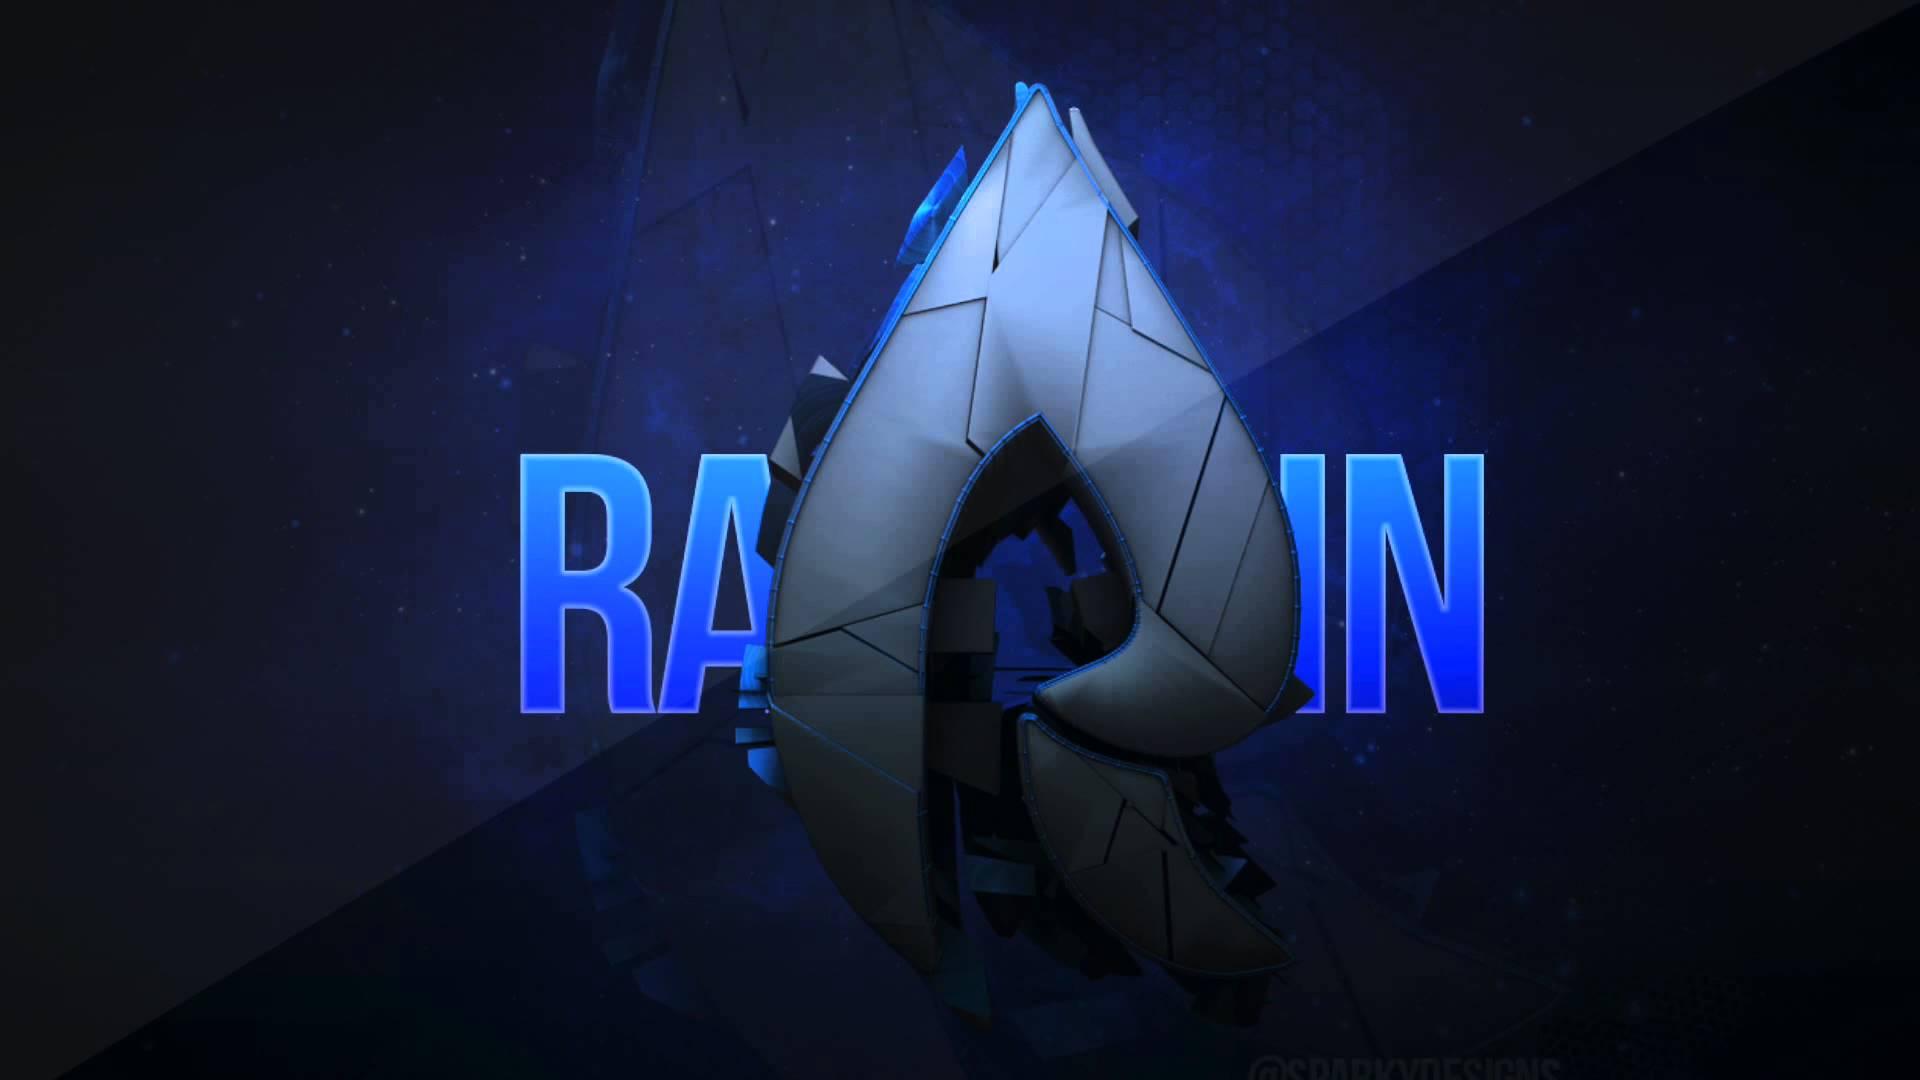 FaZe Rain Desktop Background Speed Art By Sparky 1920x1080